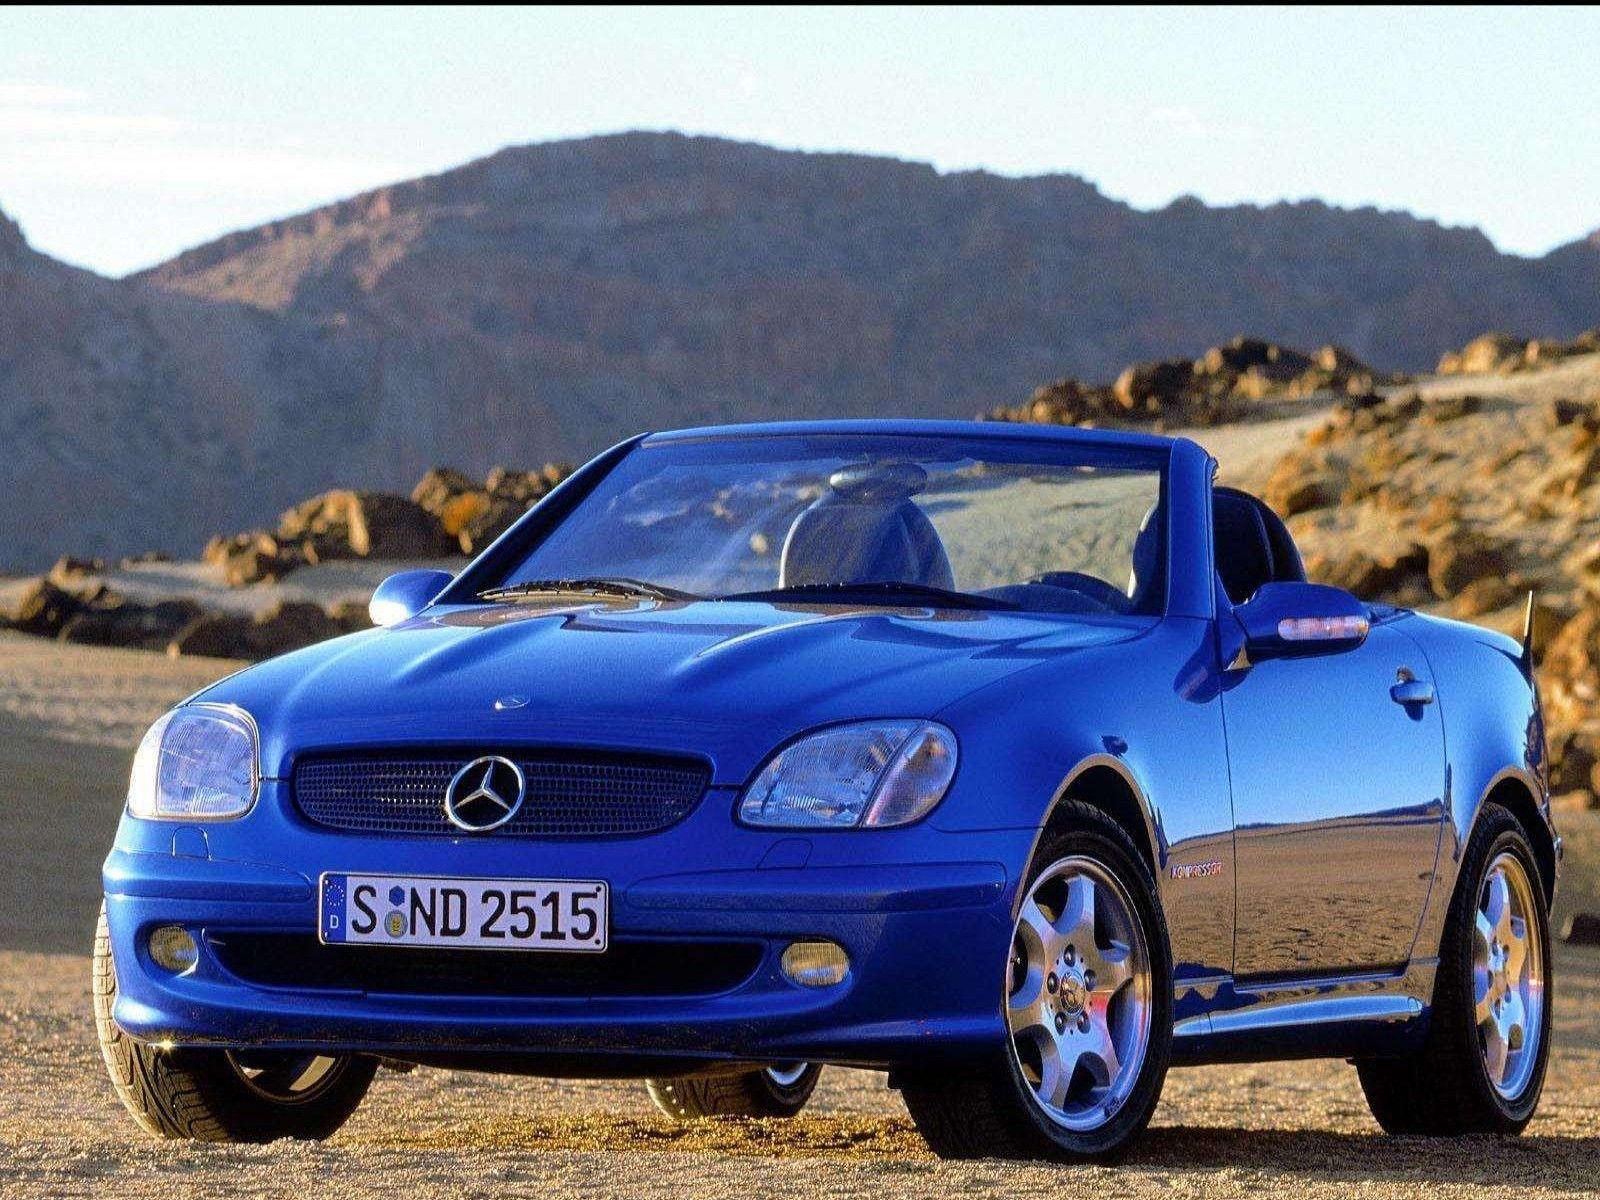 2000 Mercedes Benz Slk 200 Kompressor Mit Bildern Kompressor